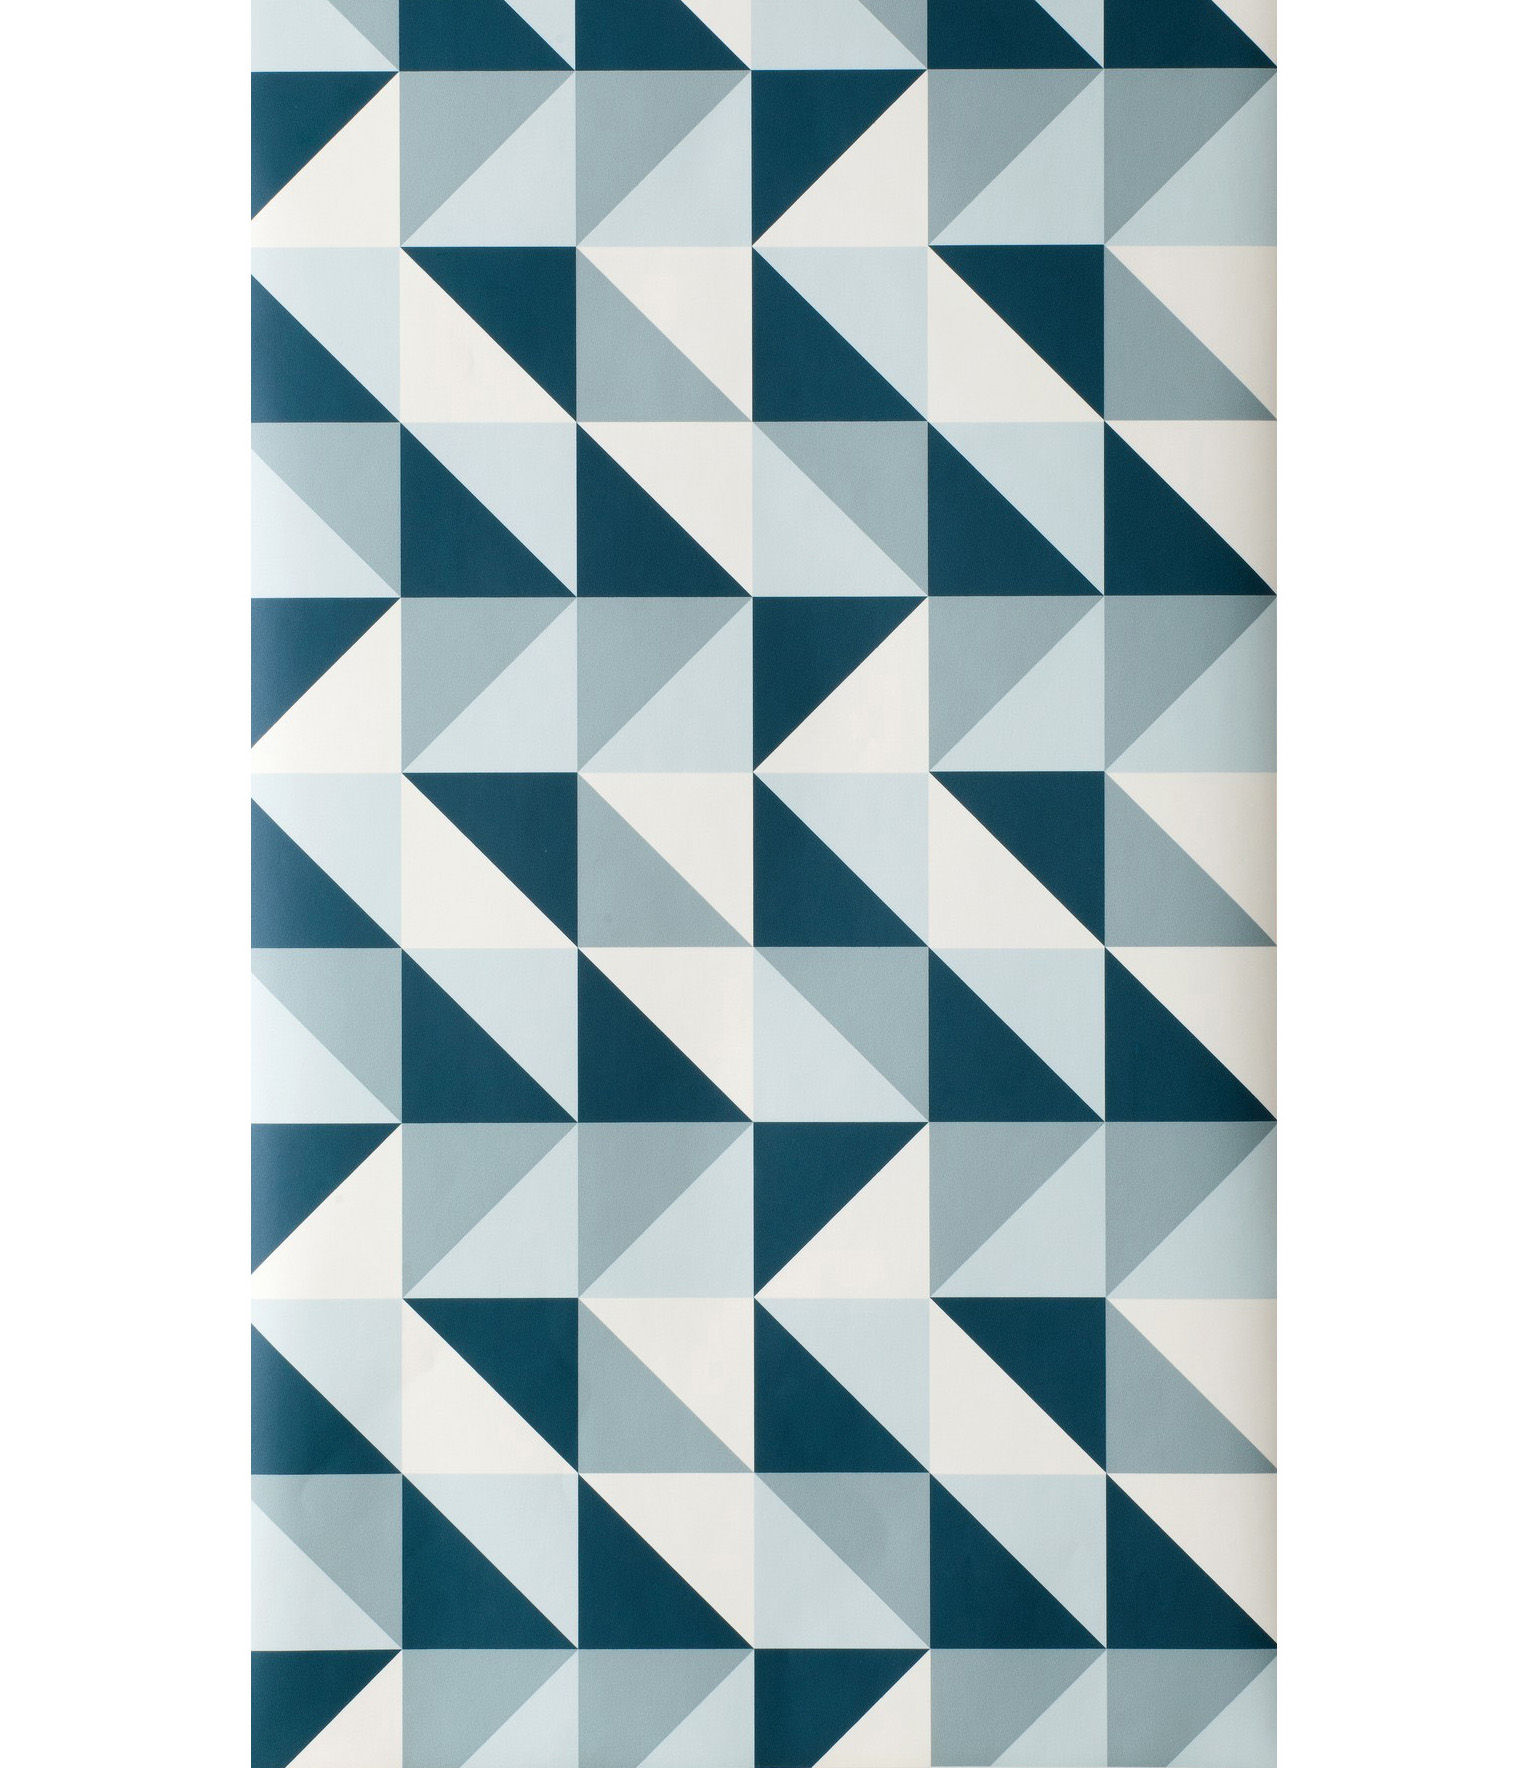 Papier Peint Remix Ferm Living Bleu Petrole Bleu Clair Blanc